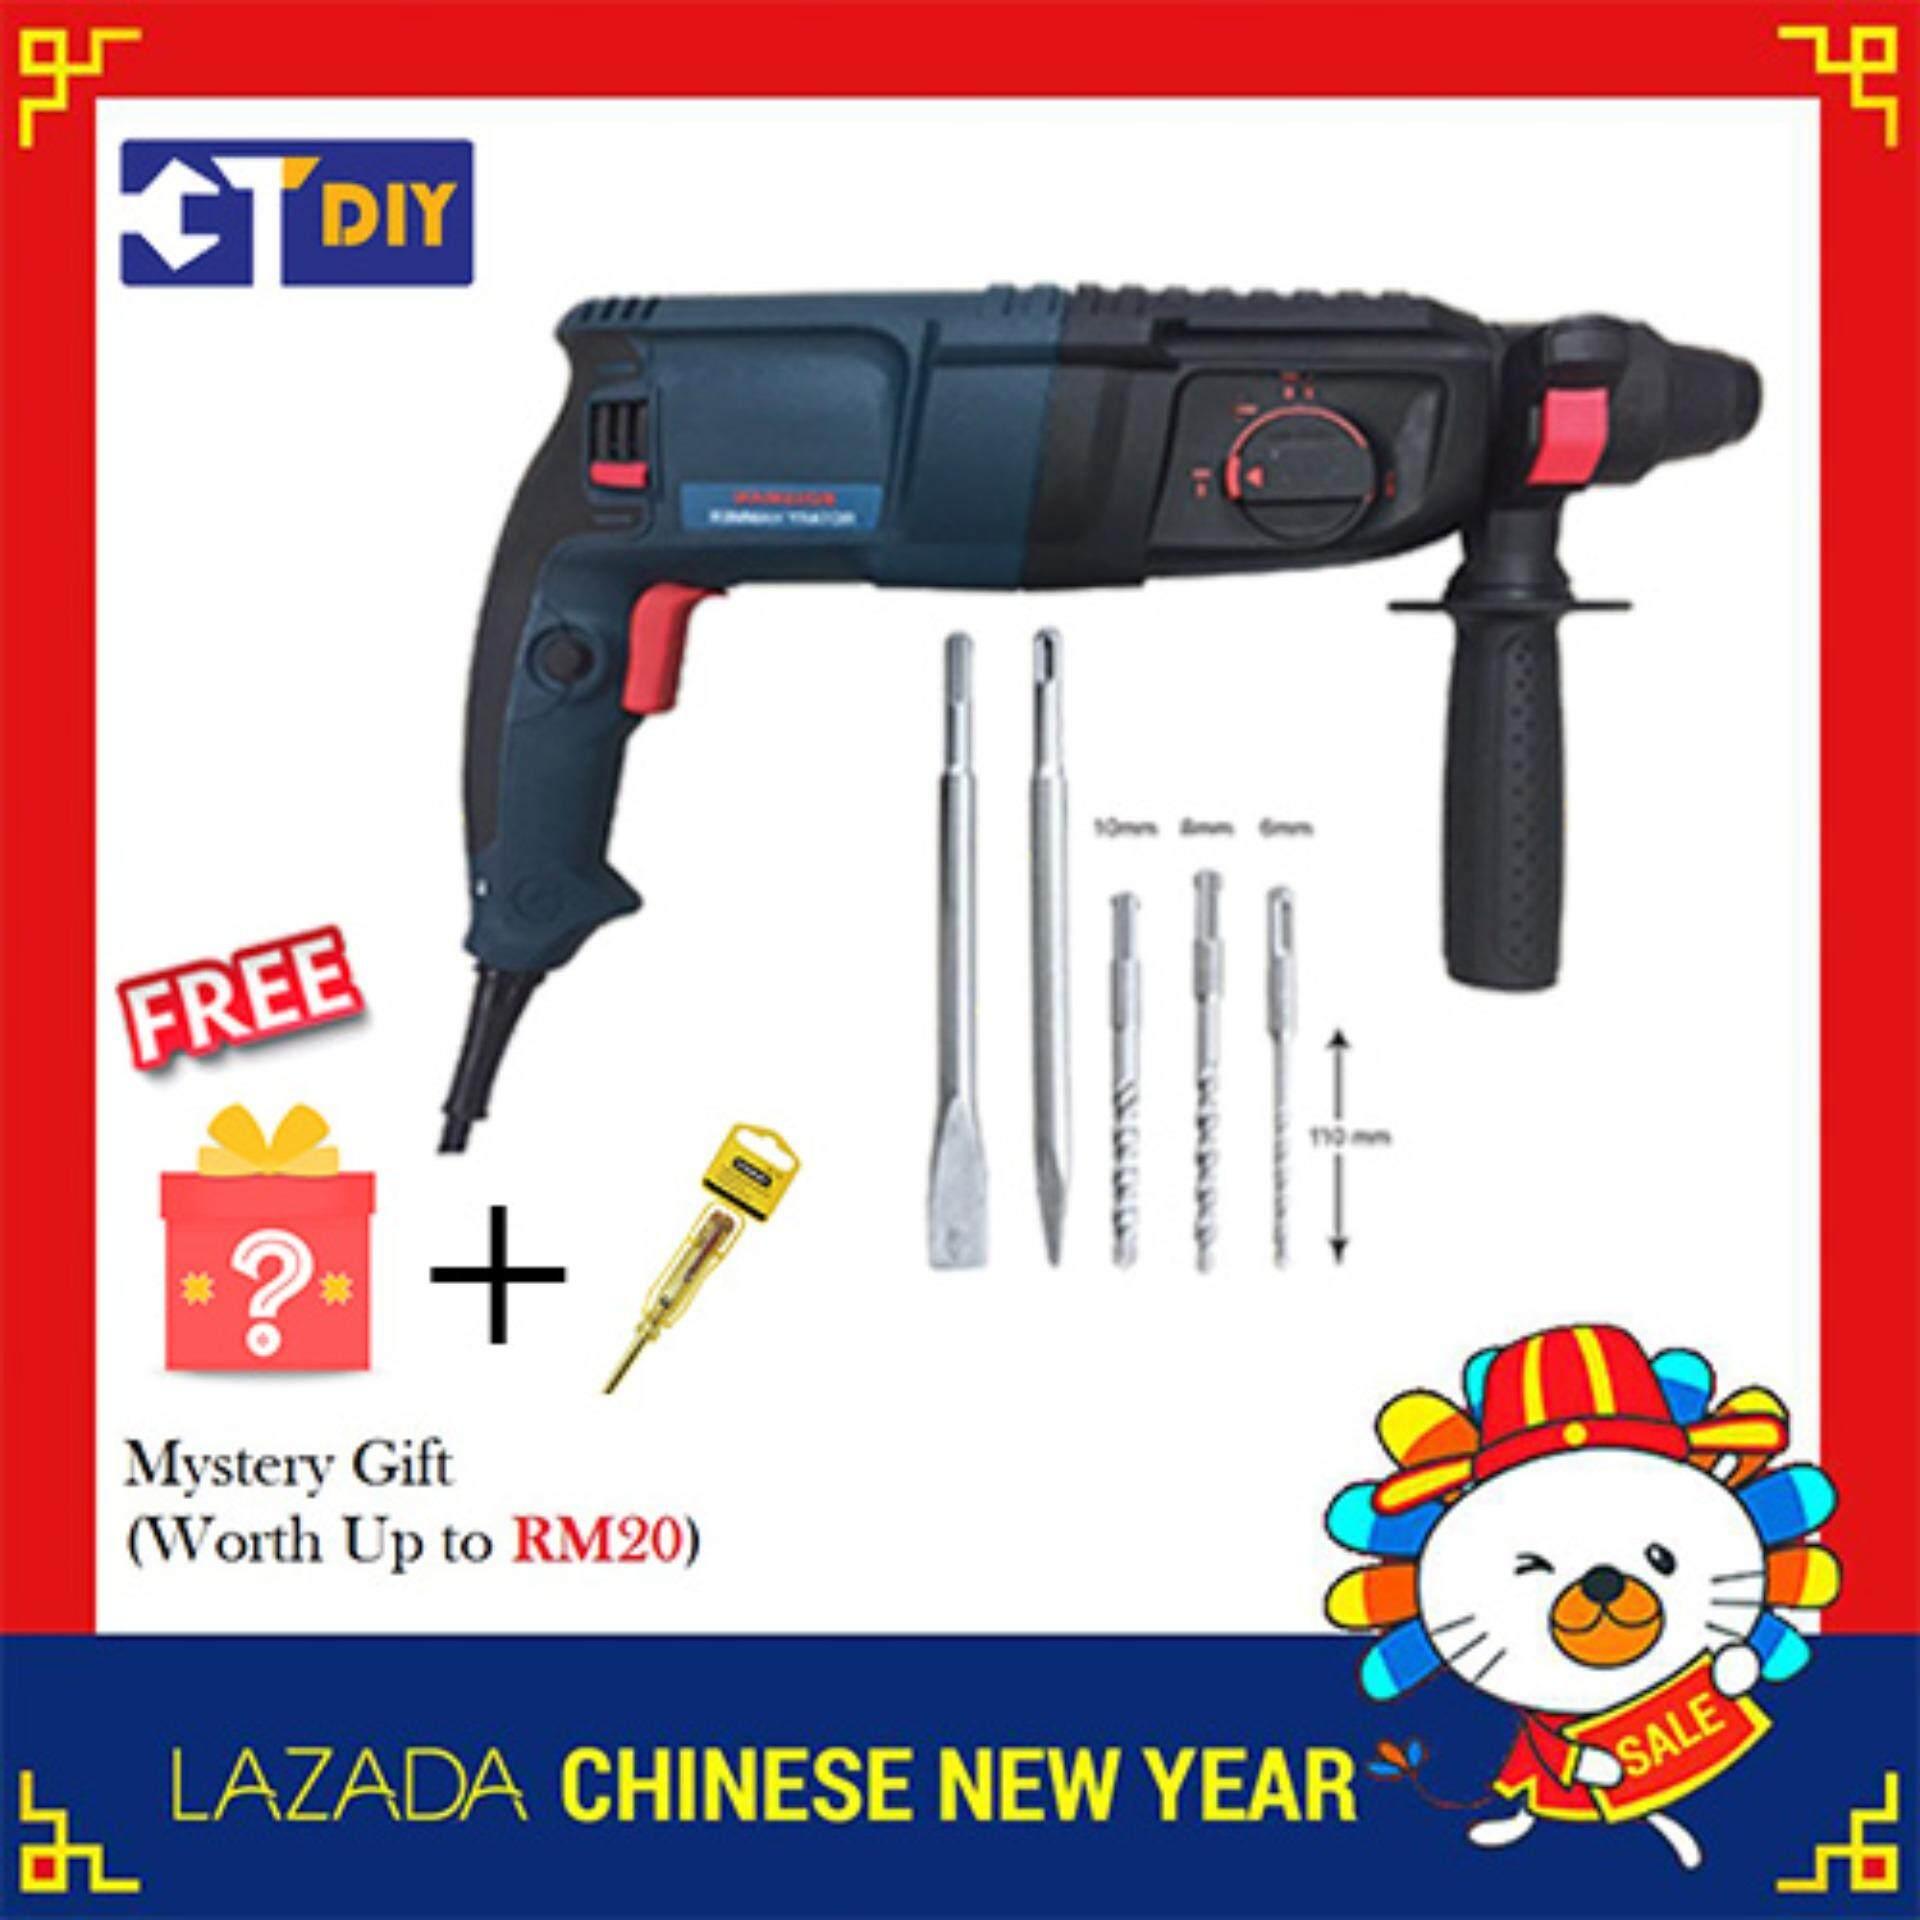 BOSSMAN Rotary Hammer Drill BGBH226 900W + FREE Testpen + MYSTERY FREE GIFT